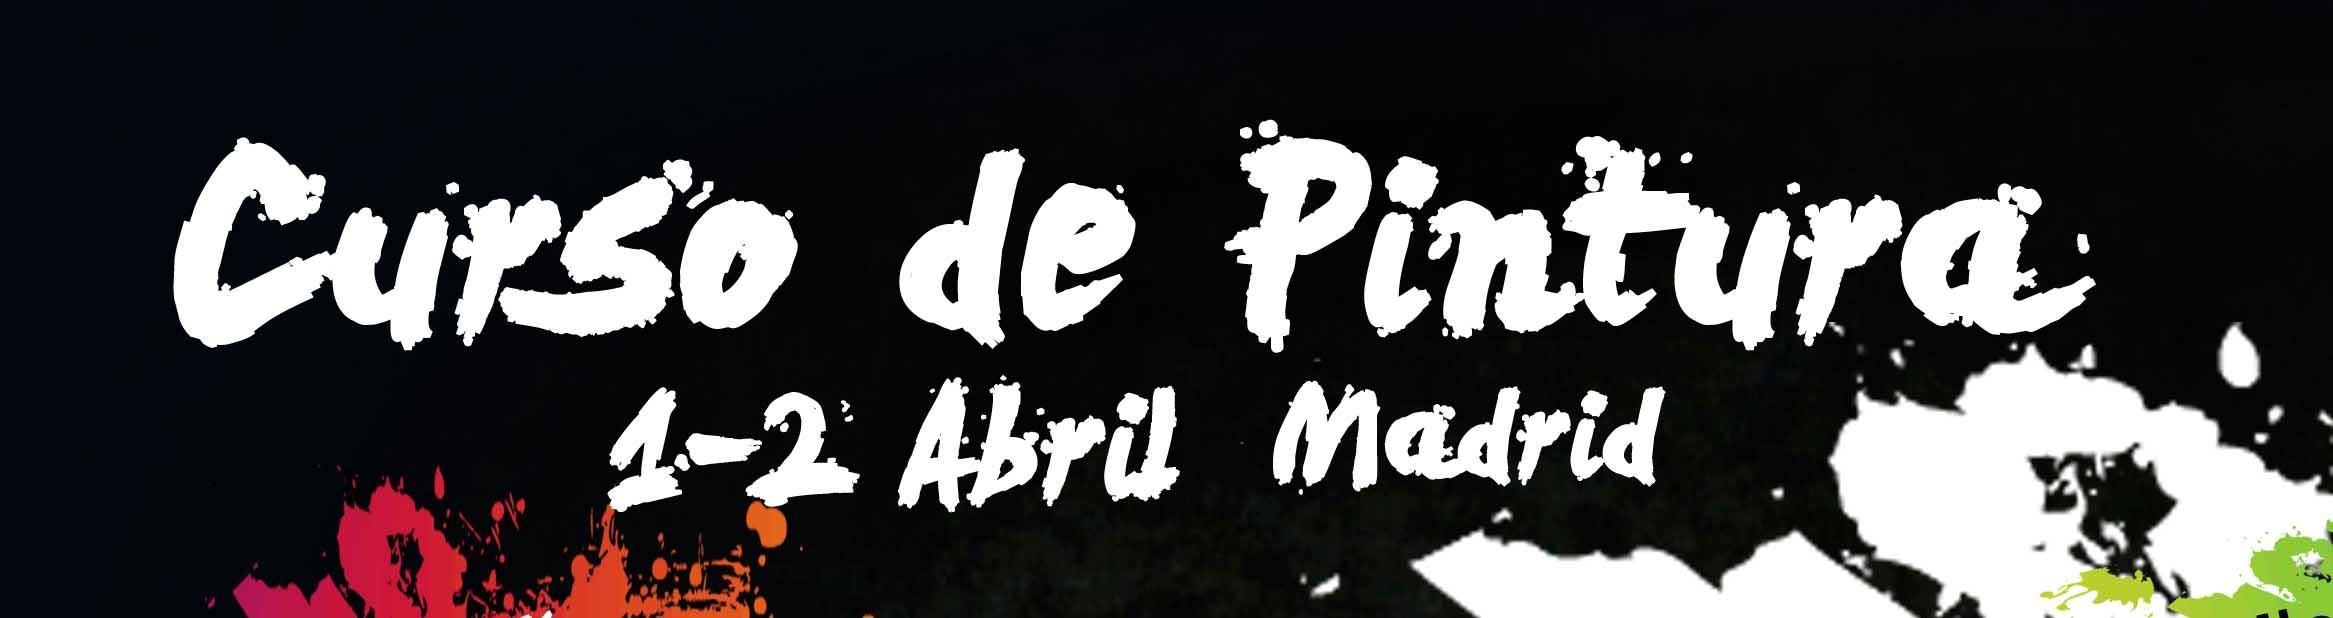 Curso 1 2 de abril en madrid pintor de miniaturas for Curso de escaparatismo madrid